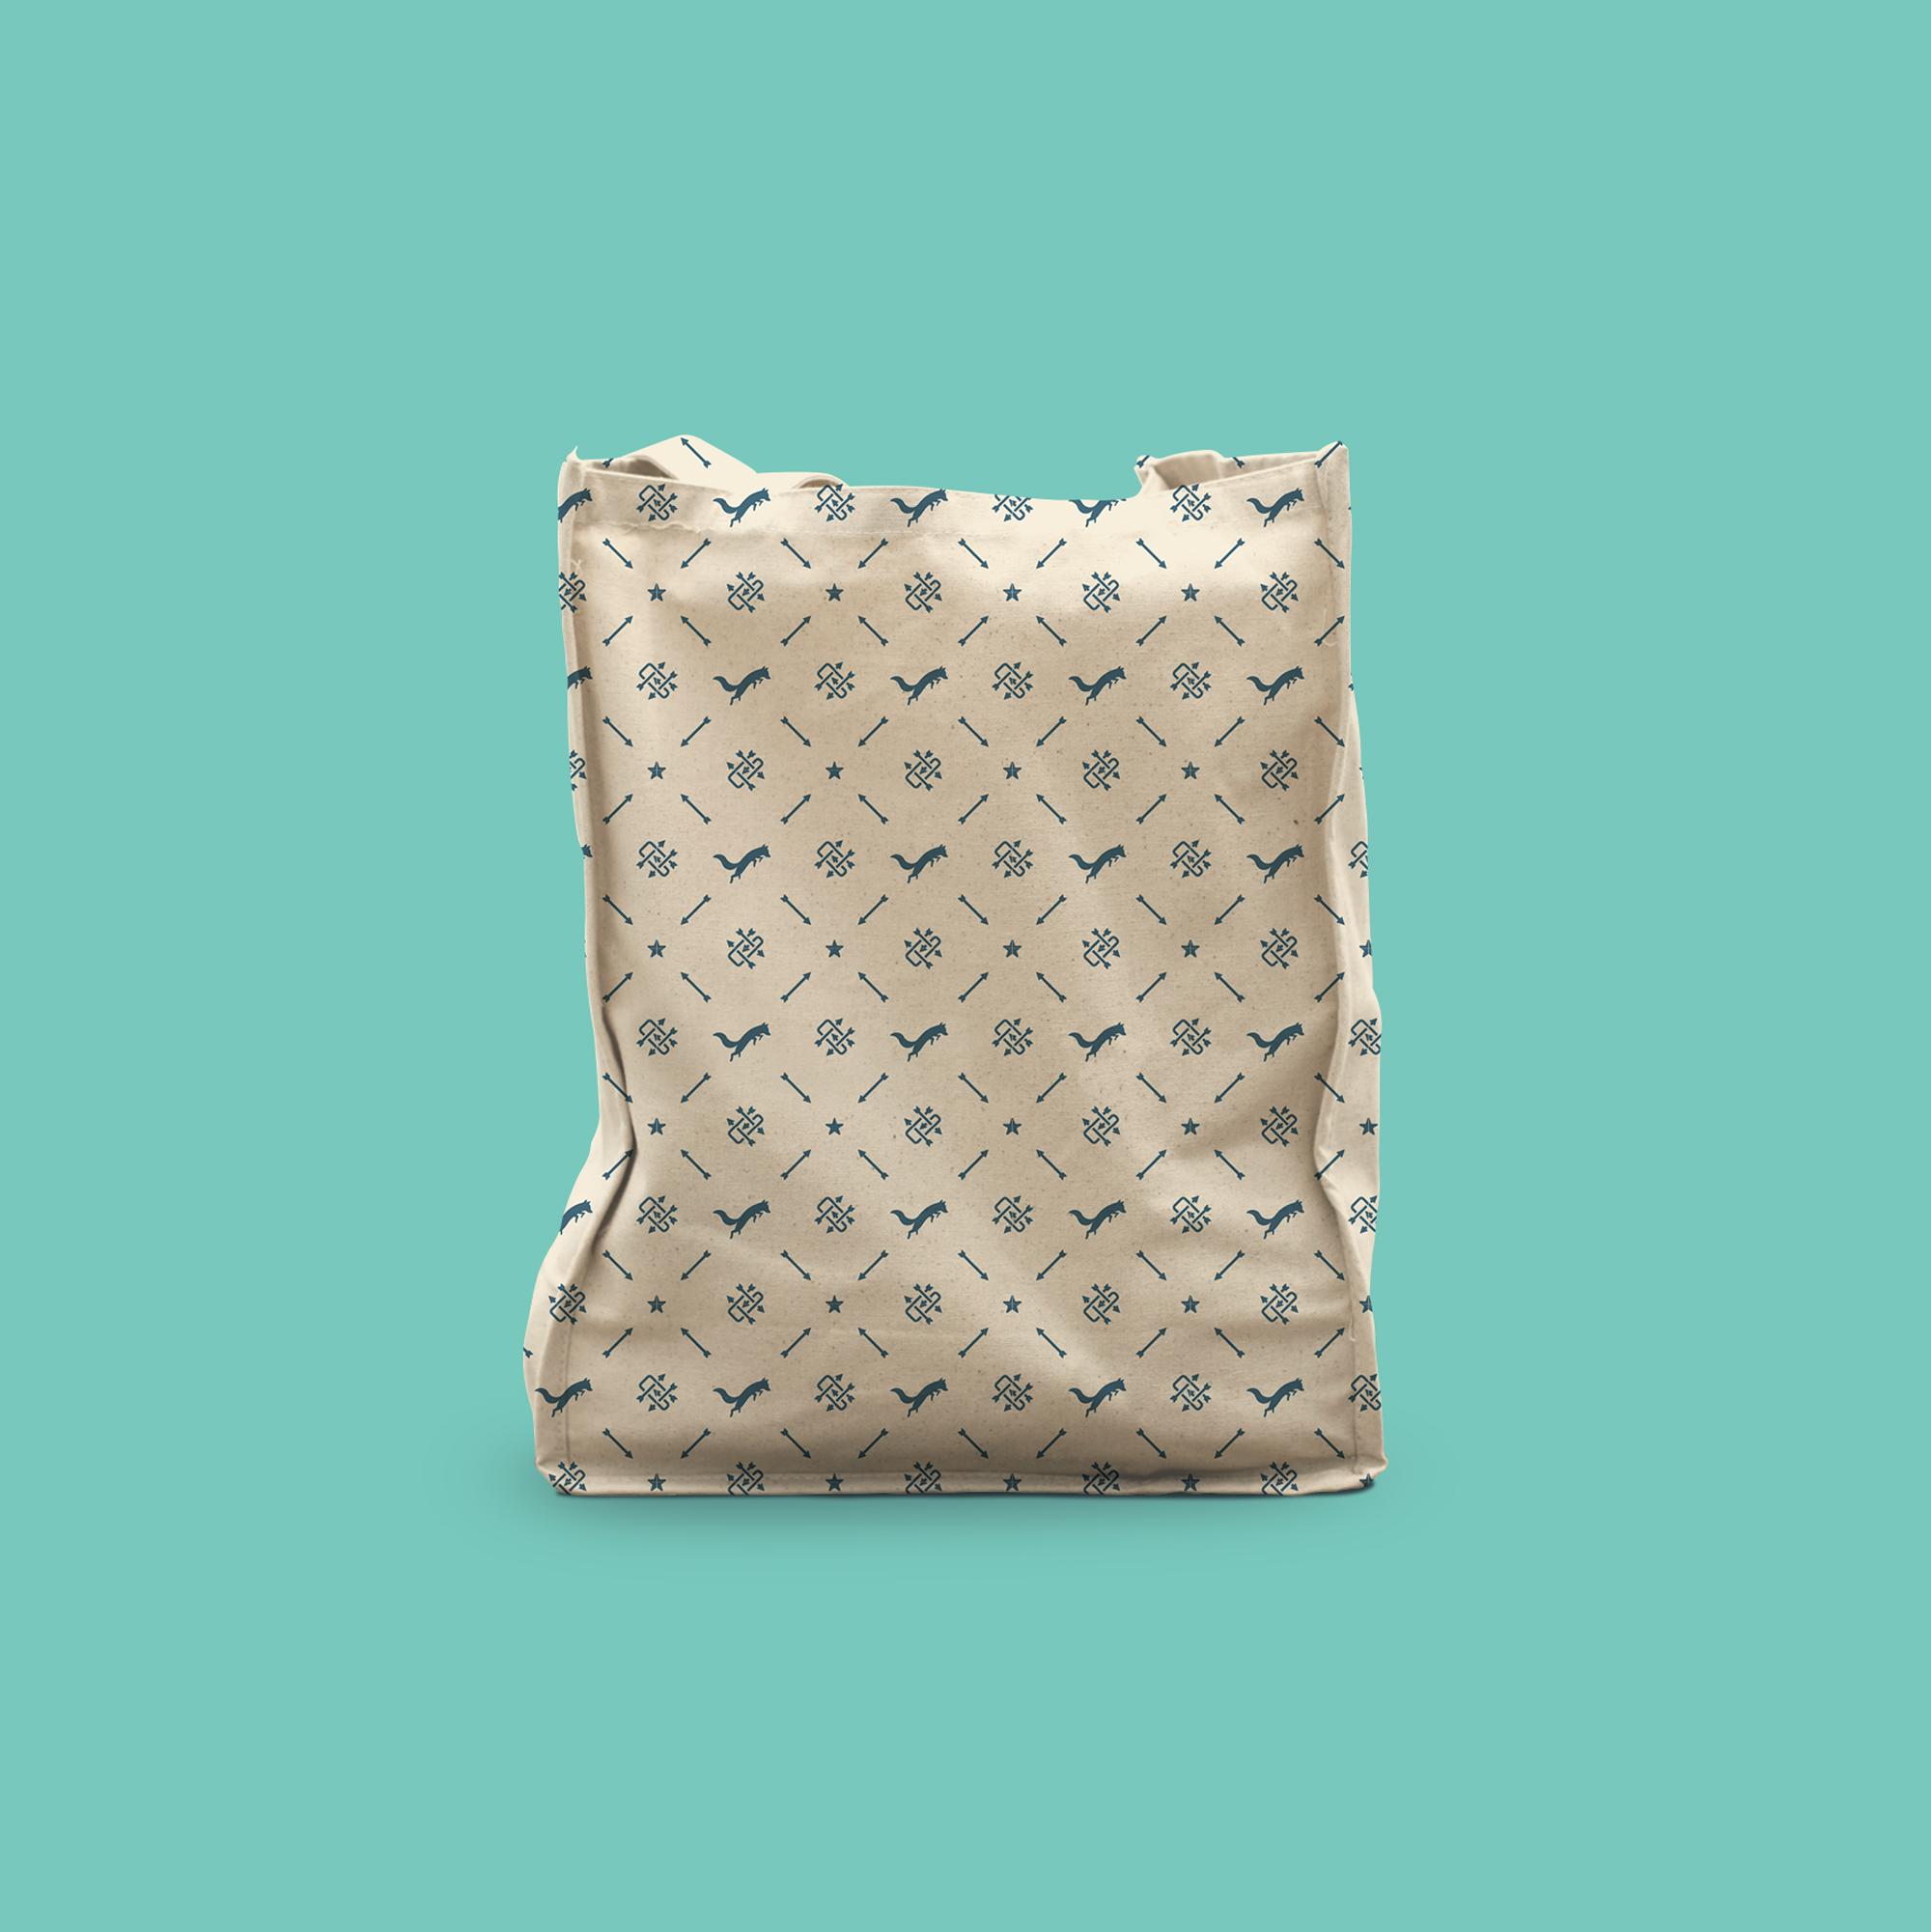 Hunter Gatherer Reusable Bag